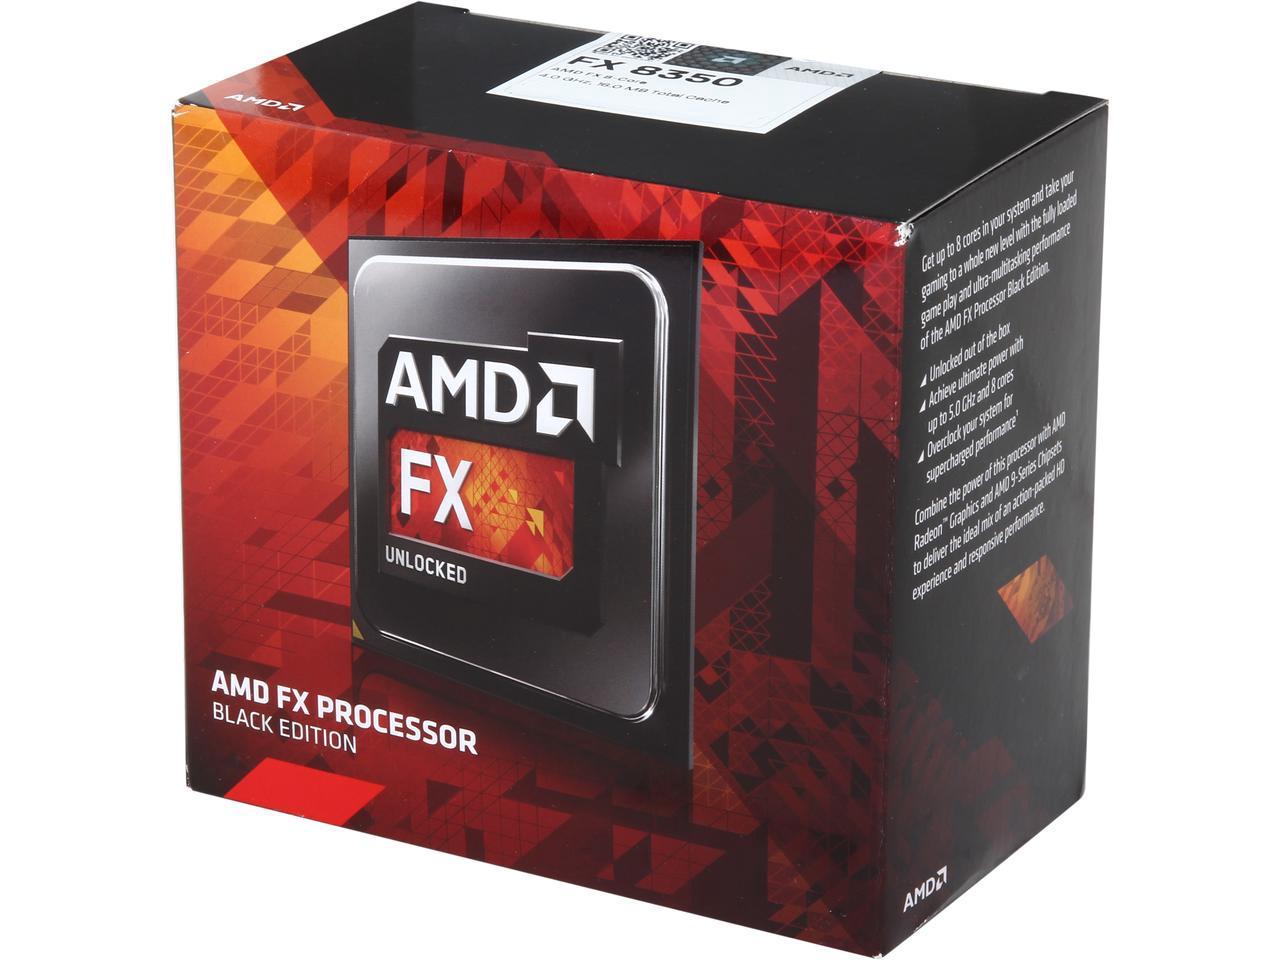 AMD FX-8350 Black Edition Vishera 8-Core 4.0 GHz (4.2 GHz Turbo) Socket AM3+ 125W FD8350FRHKBOX Desktop Processor $109.99